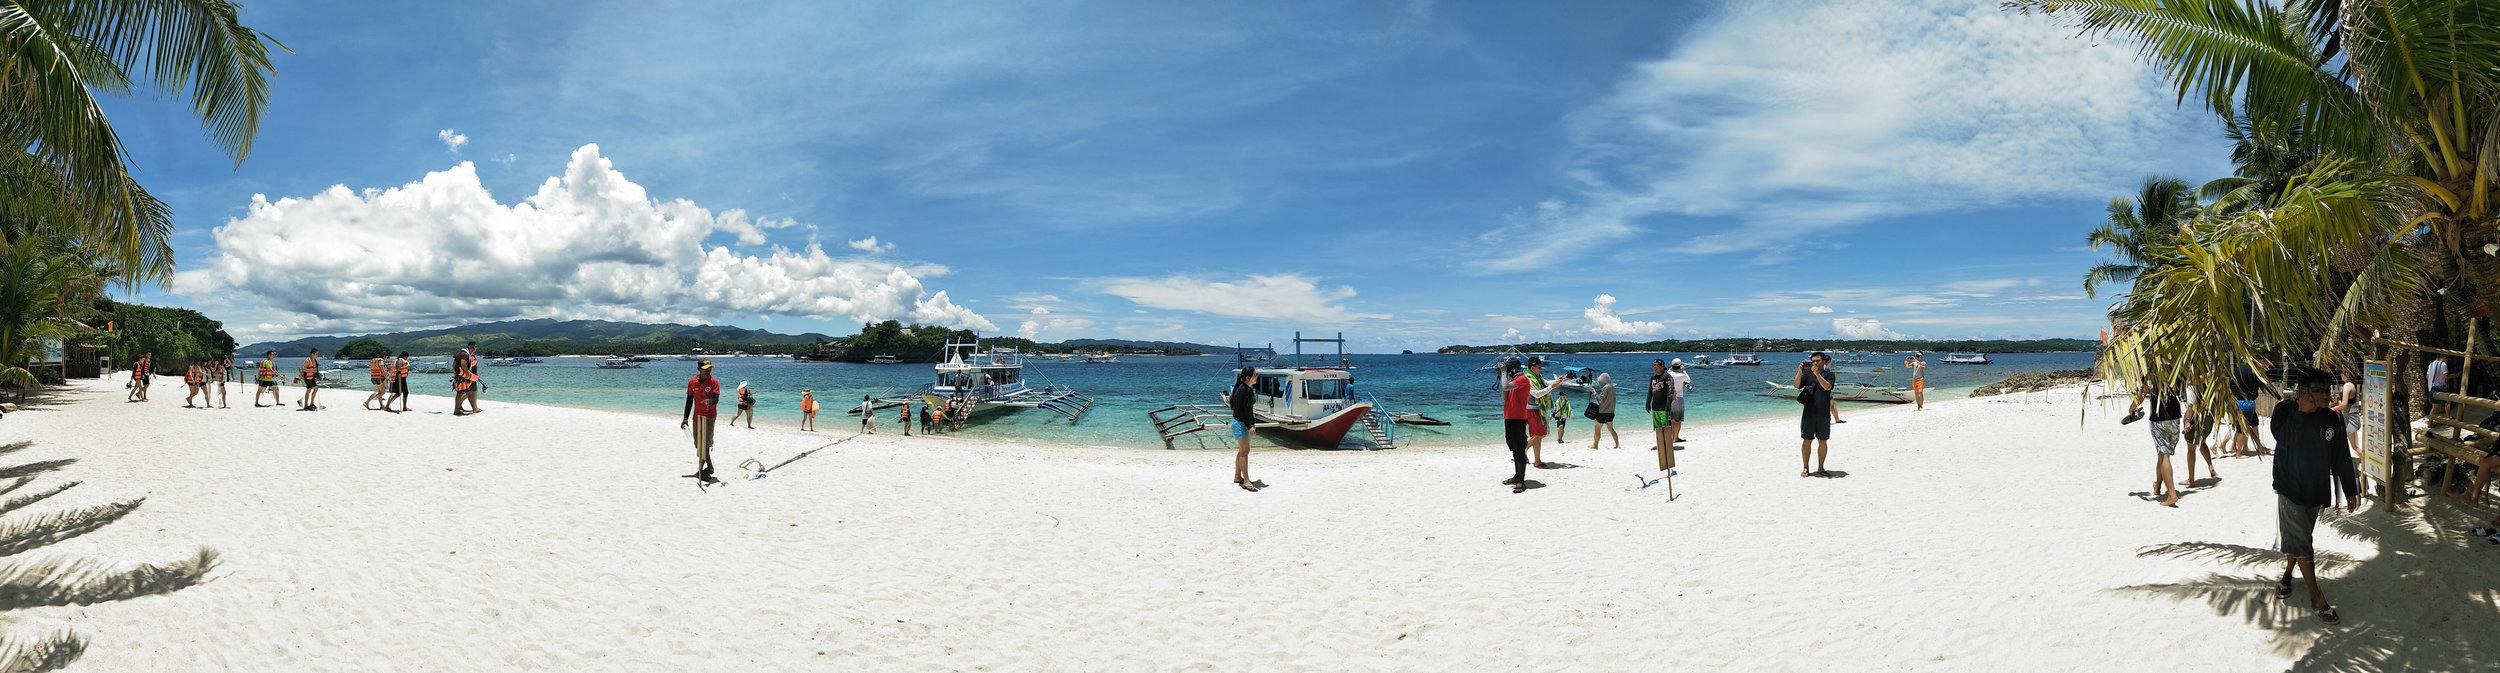 The Philippines— Randolf Alcober